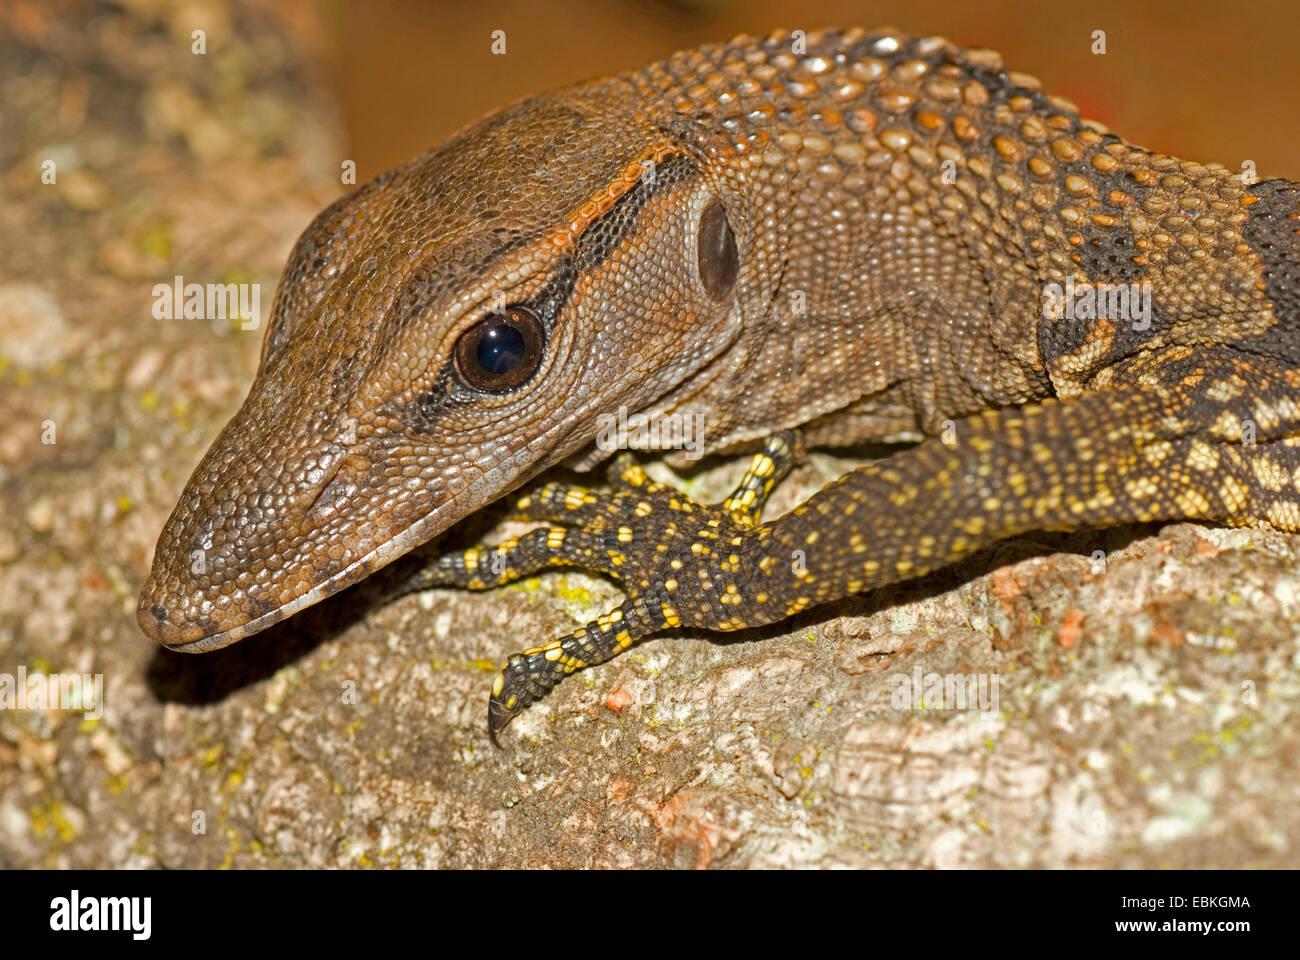 Áspero-necked monitor, Árbol, Arlequín lagarto monitor (Varanus rudicollis), Retrato Imagen De Stock